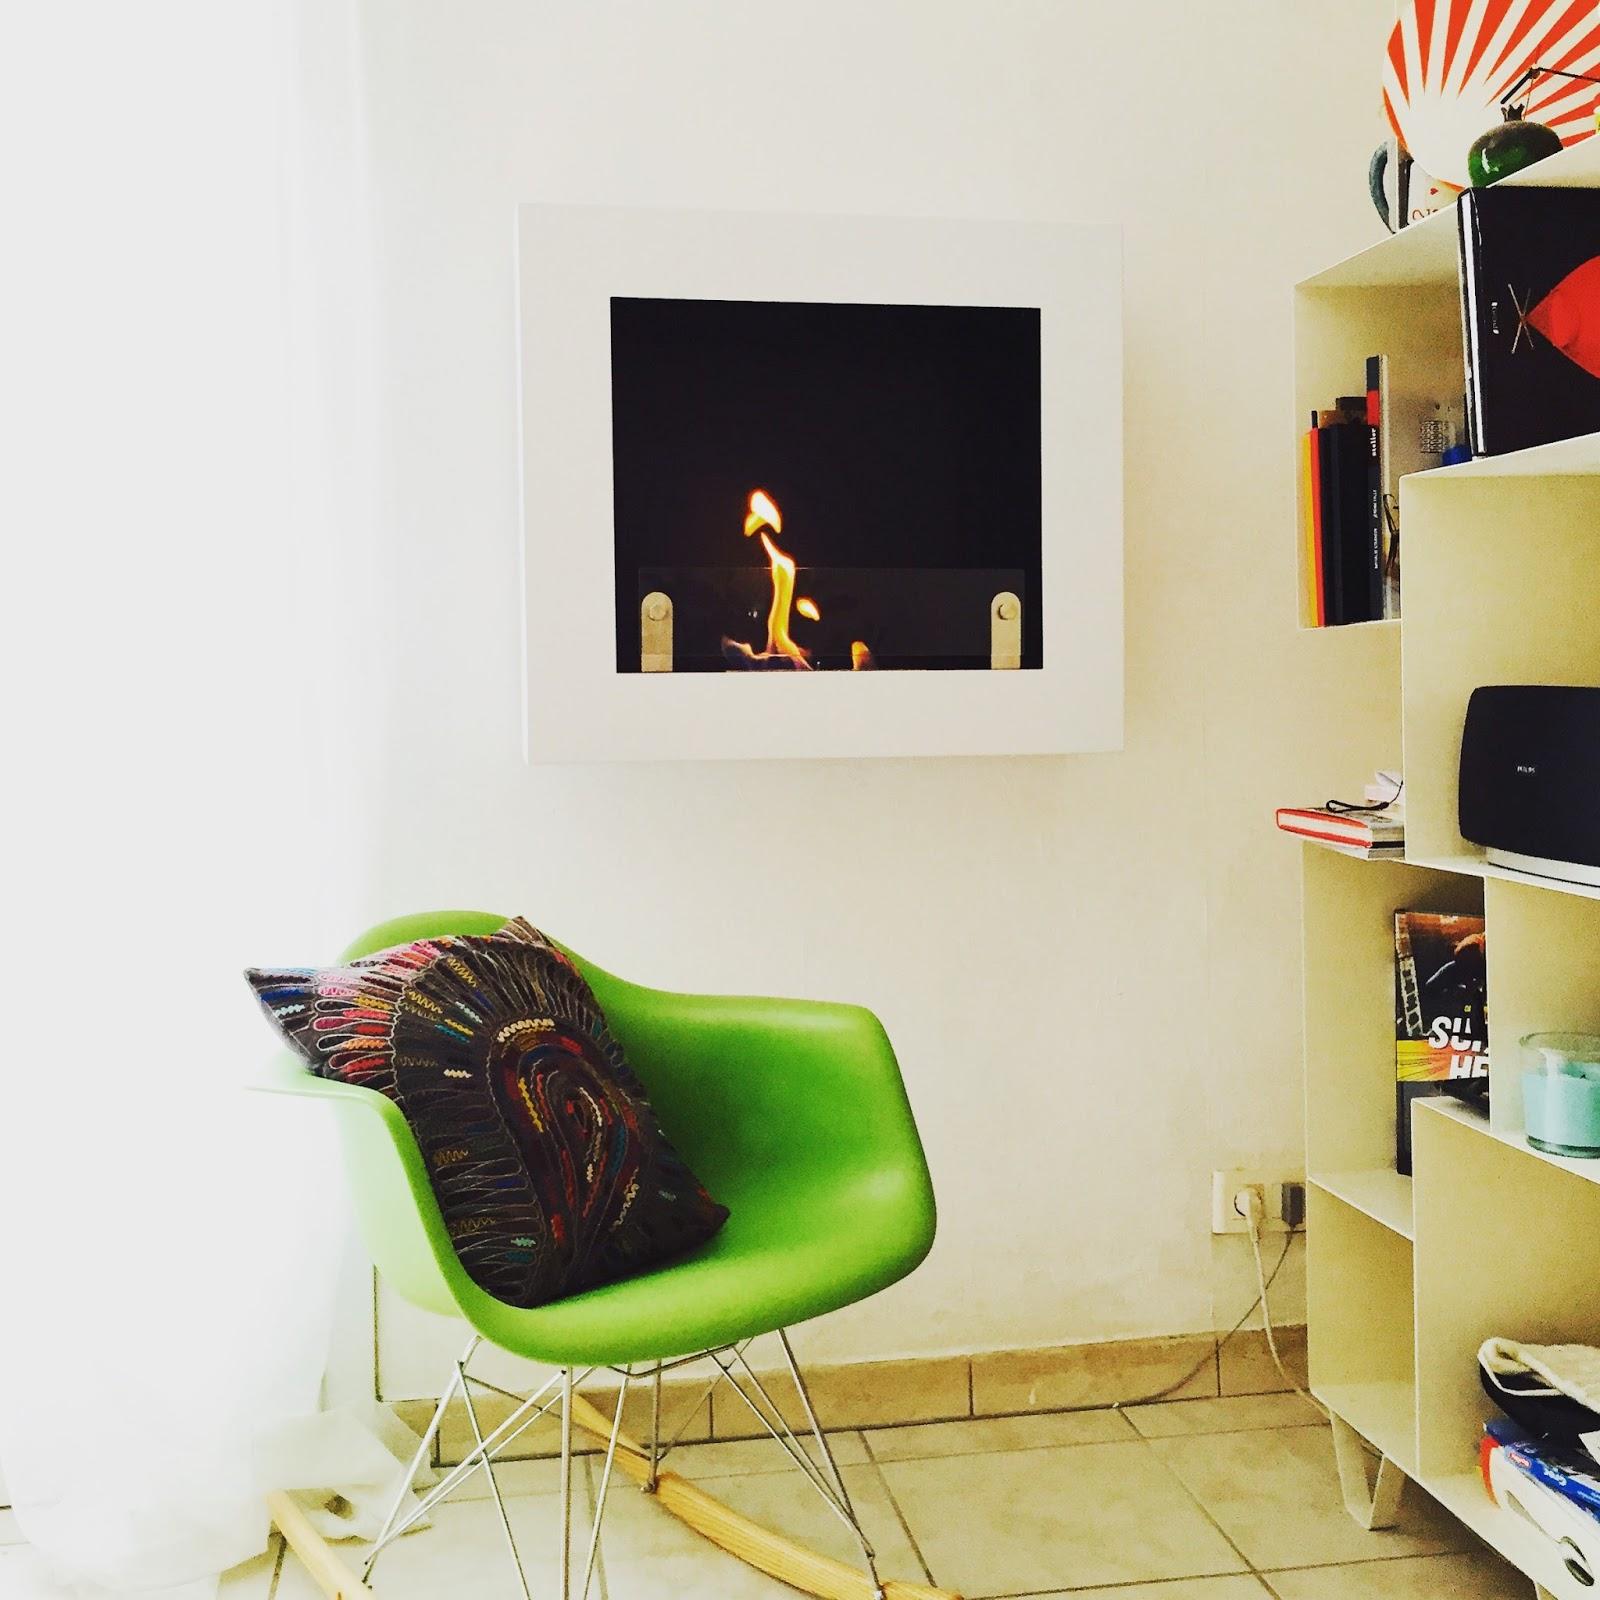 test pleins feux sur ma chemin e l 39 thanol initiales gg. Black Bedroom Furniture Sets. Home Design Ideas